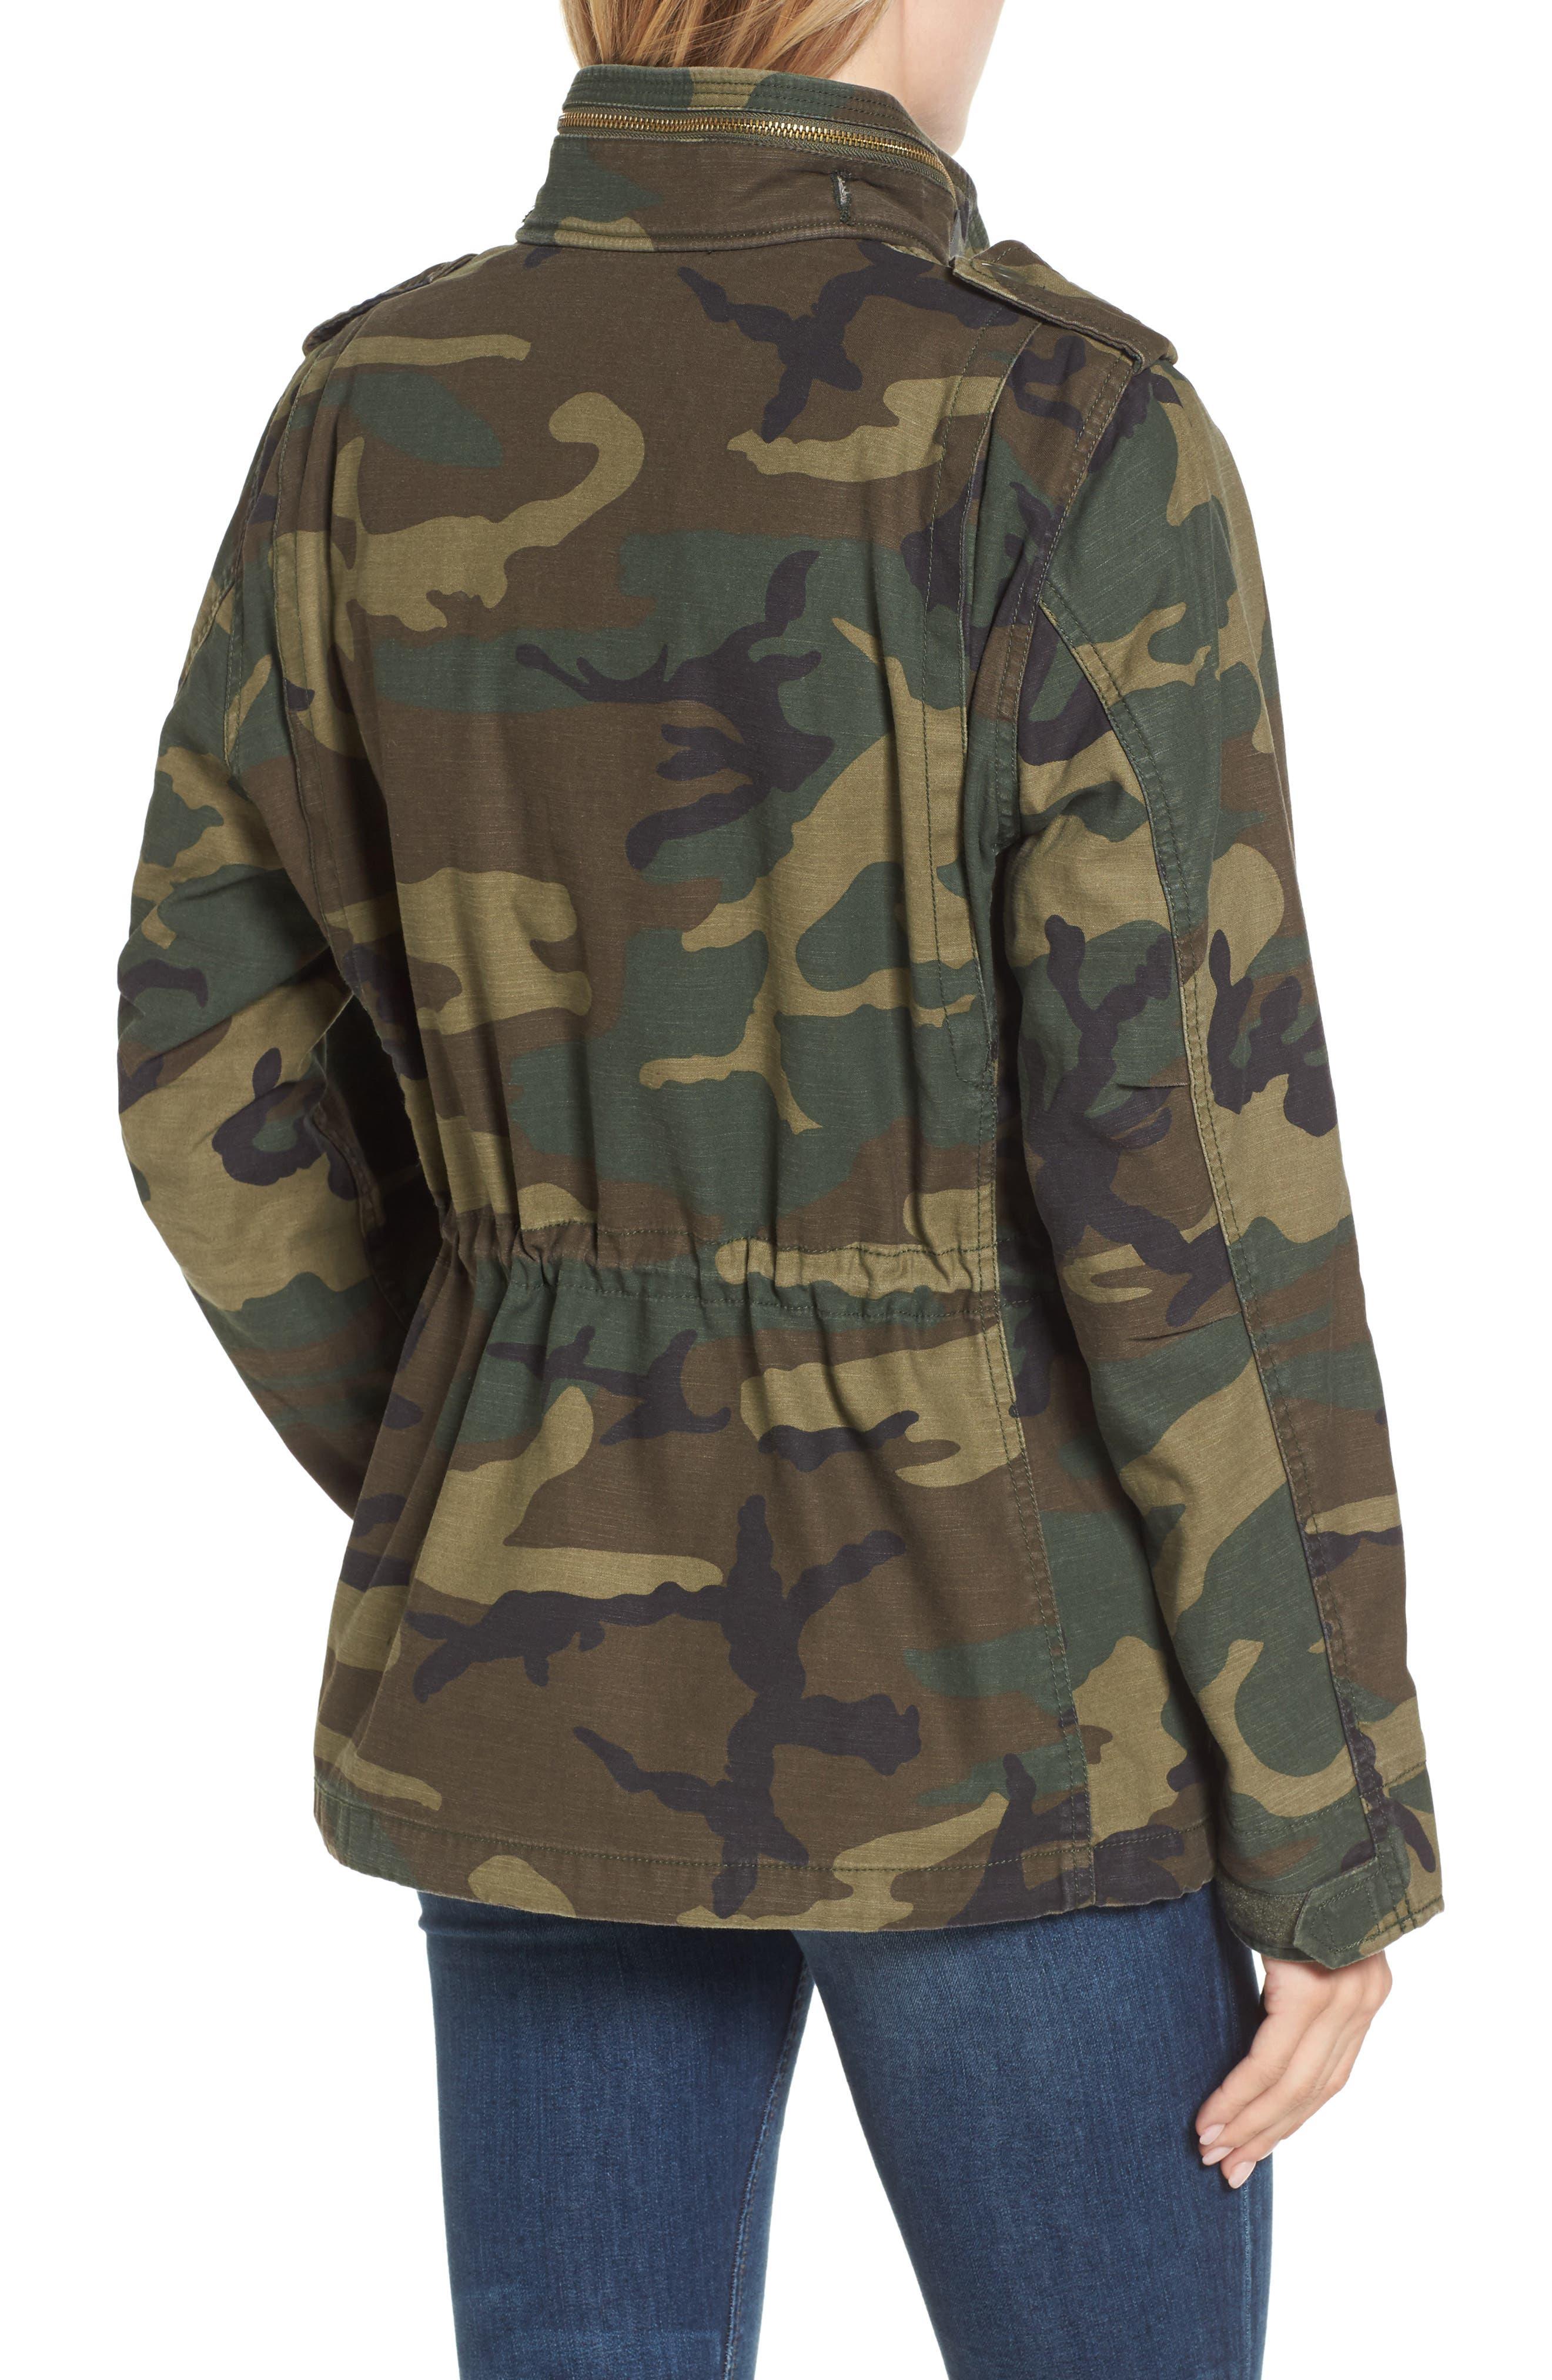 M-65 Defender Camo Field Jacket,                             Alternate thumbnail 2, color,                             Woodland Camo